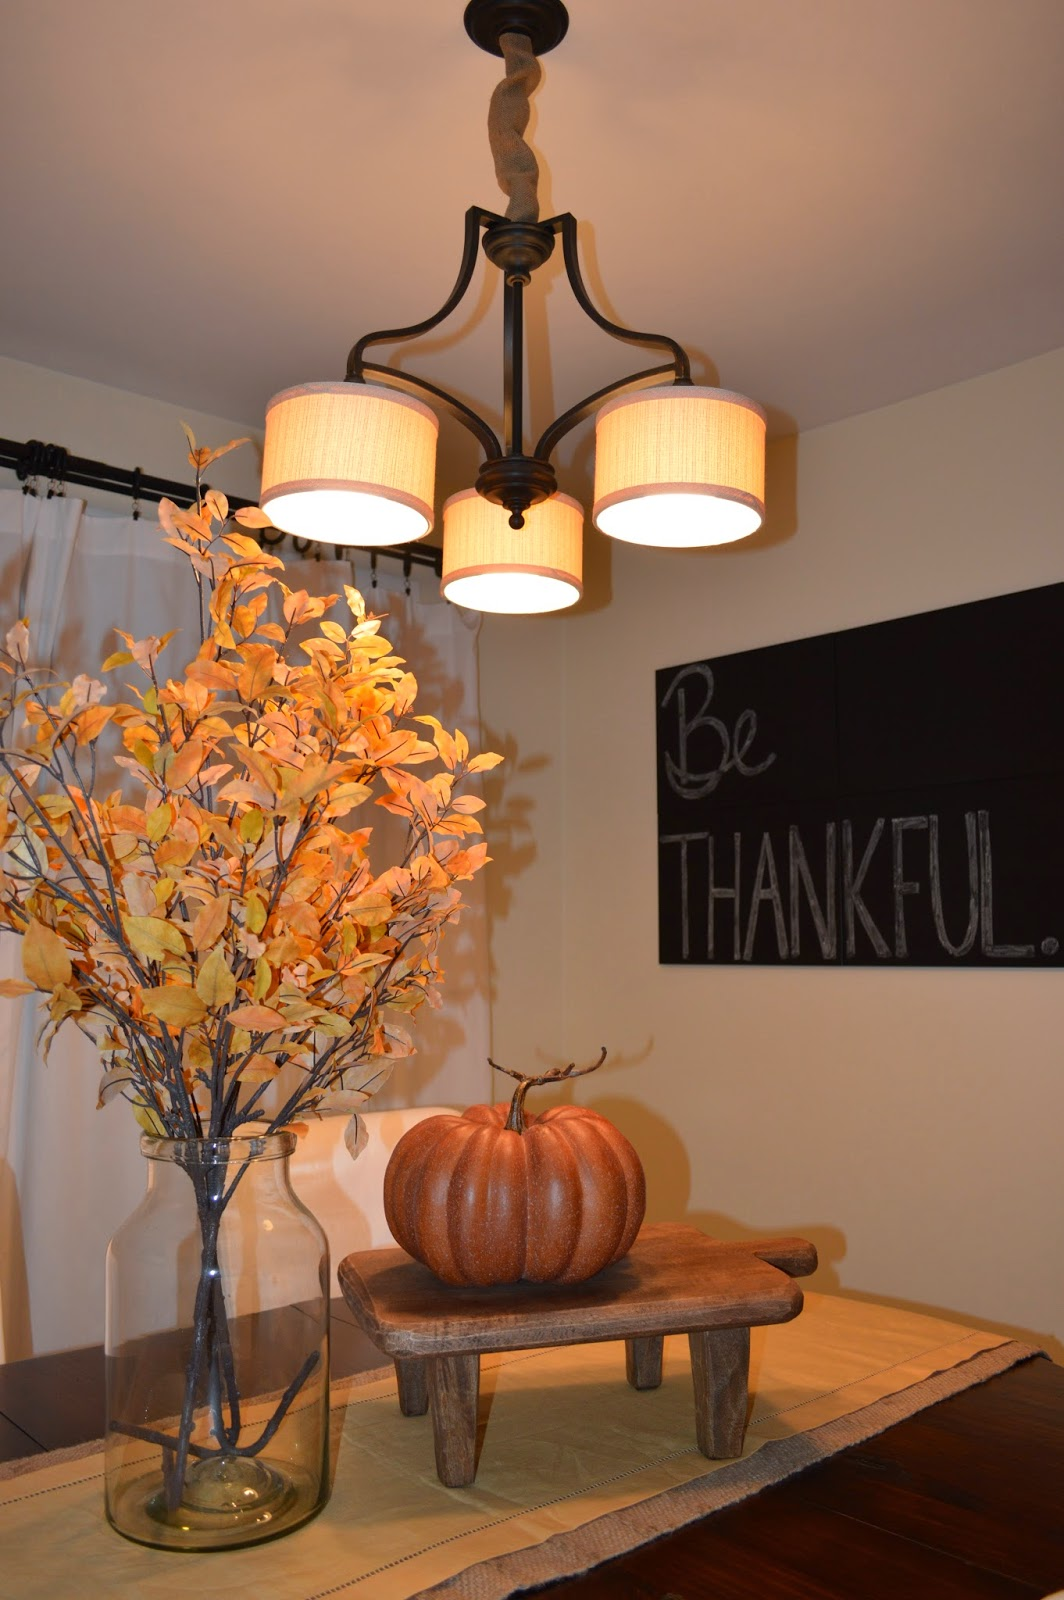 Ashley S Nest Decorating A Dining Room: Ashley's Nest: Decorating A Dining Room For Thanksgiving